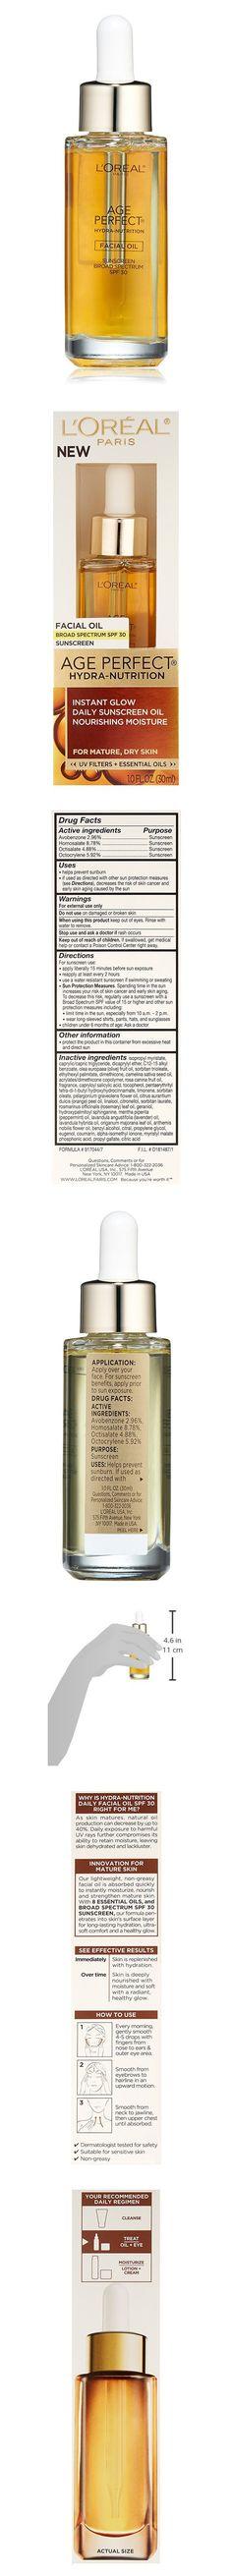 L'Oreal Paris Age Perfect Hydra-Nutrition Facial Oil SPF 30 #beauty #lorealparis